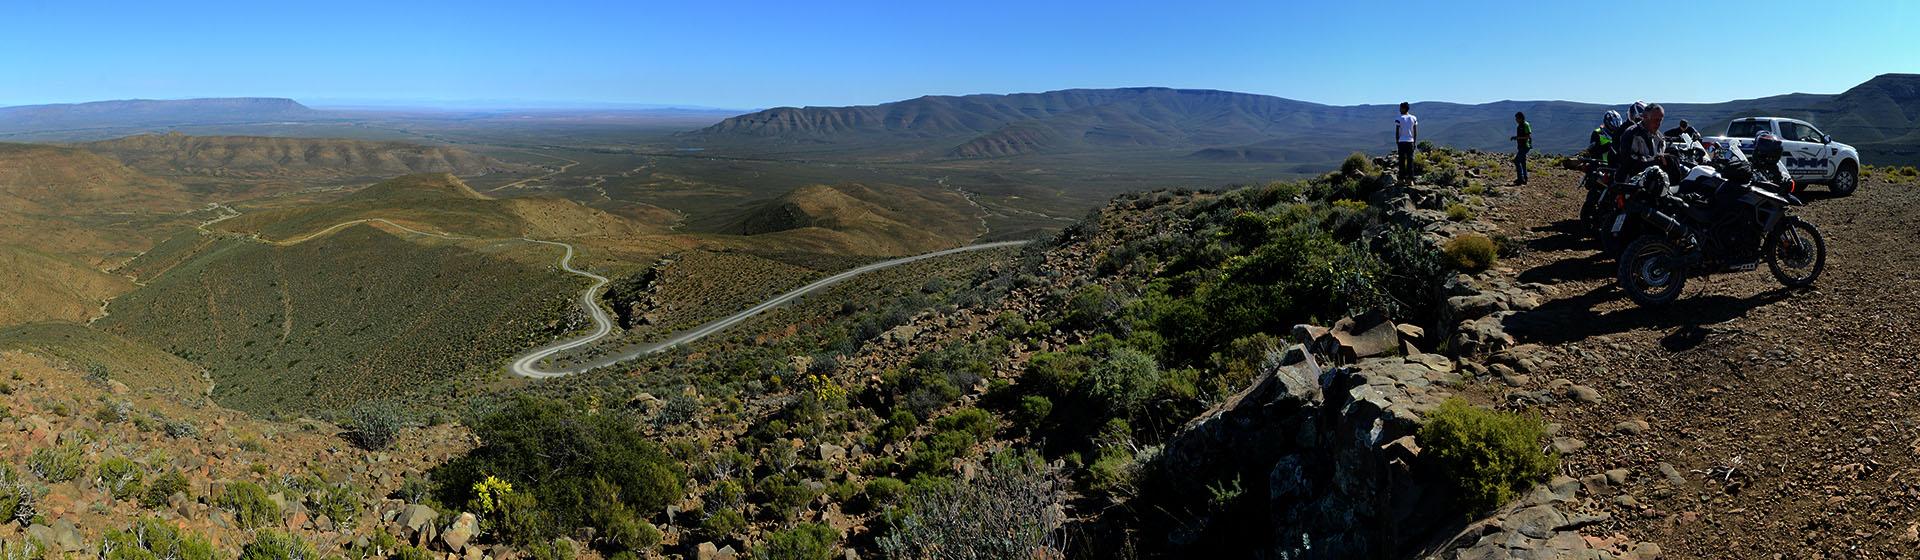 Ouberg Pass, Tankwa Karoo